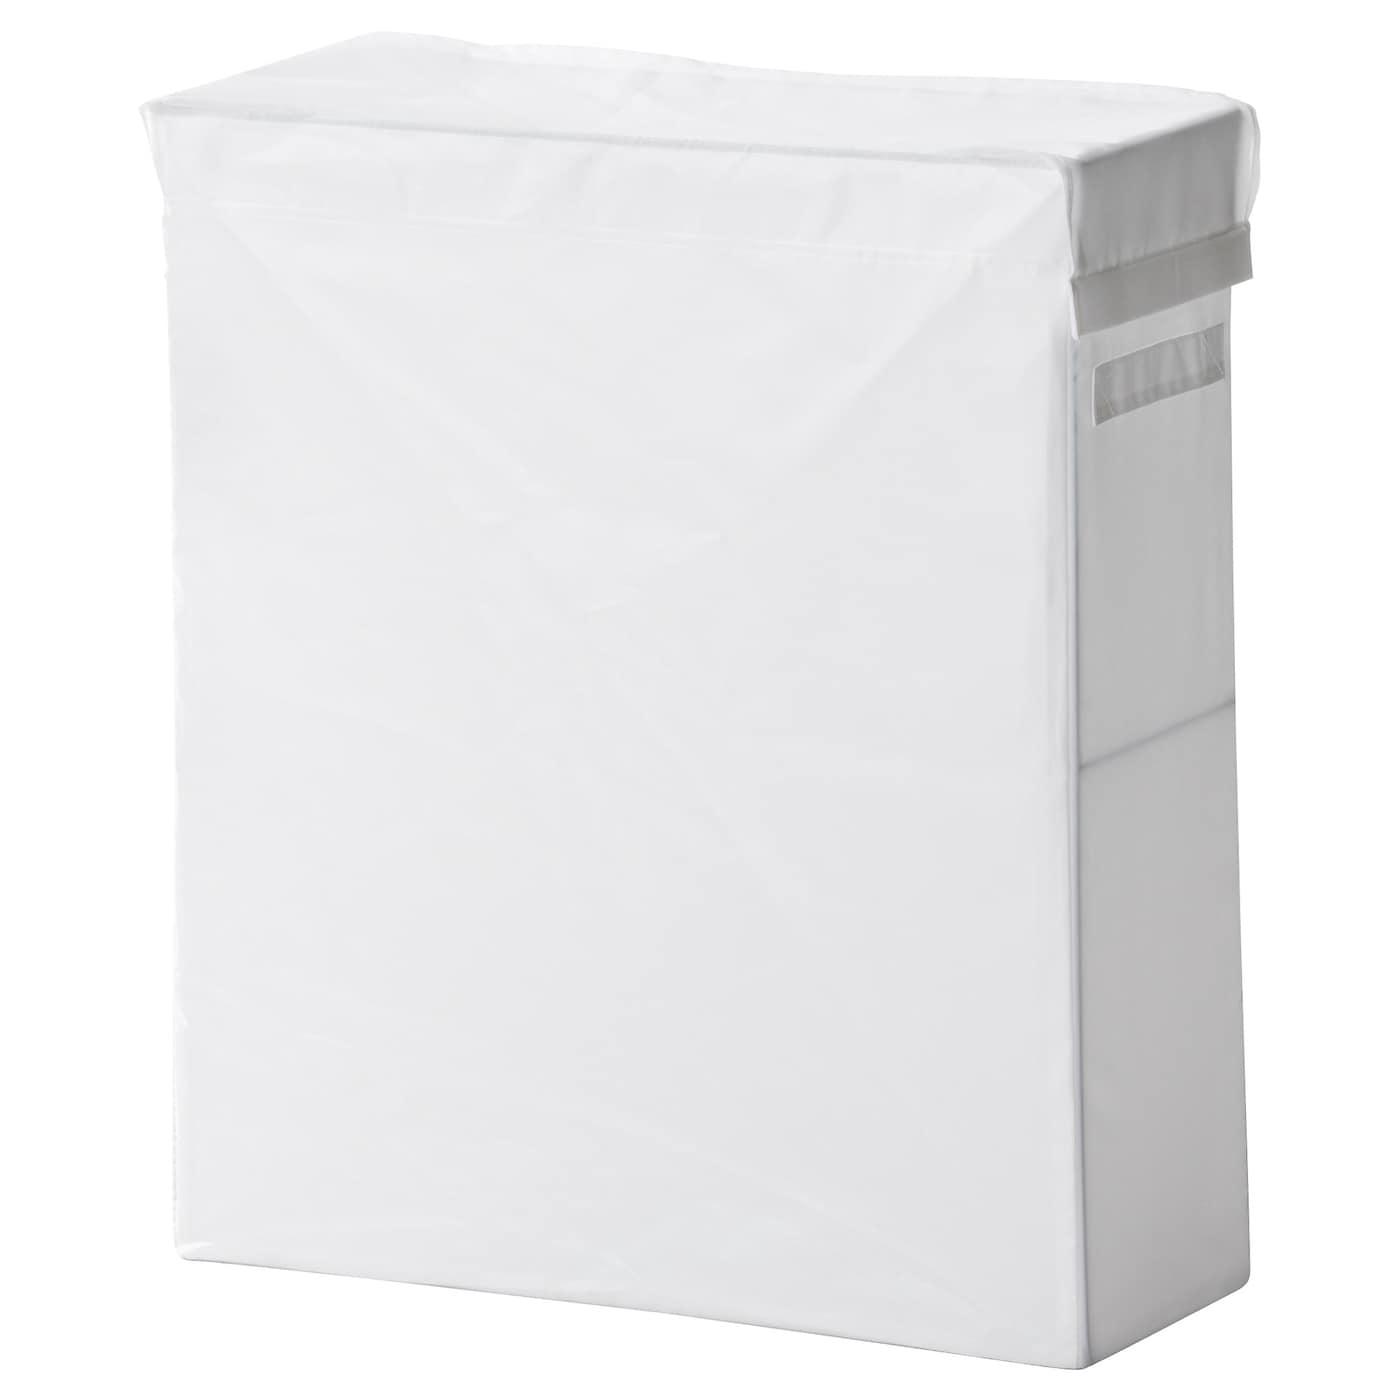 Skubb sac linge et support blanc 80 l ikea for Paniers blancs ikea